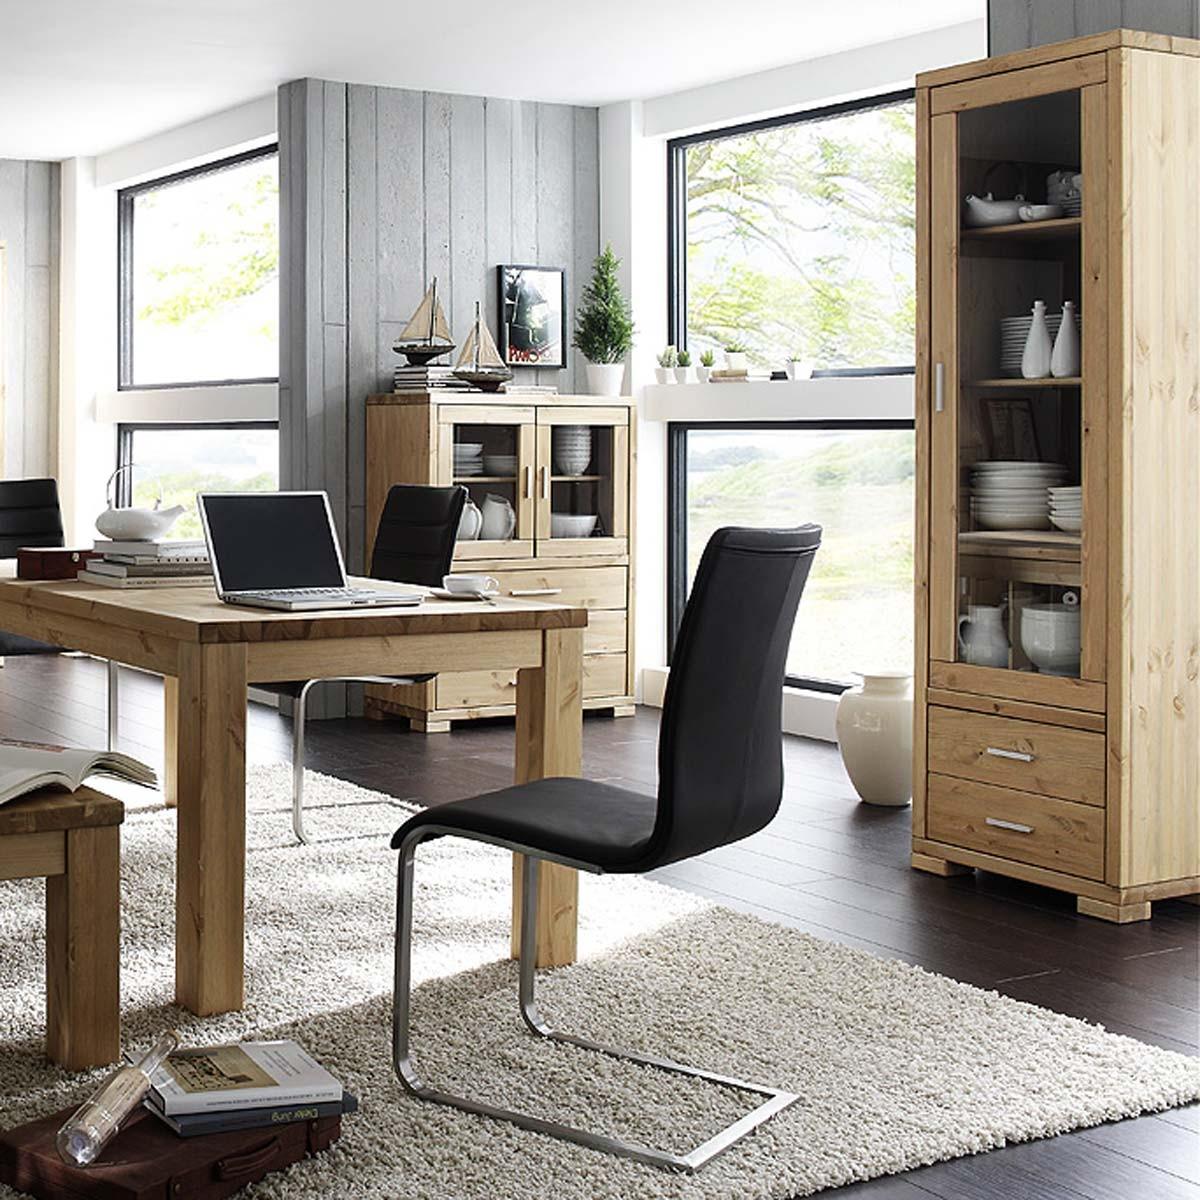 vitrinenschrank vitrine standvitrine kiefer holz massiv d nische beize neu ebay. Black Bedroom Furniture Sets. Home Design Ideas